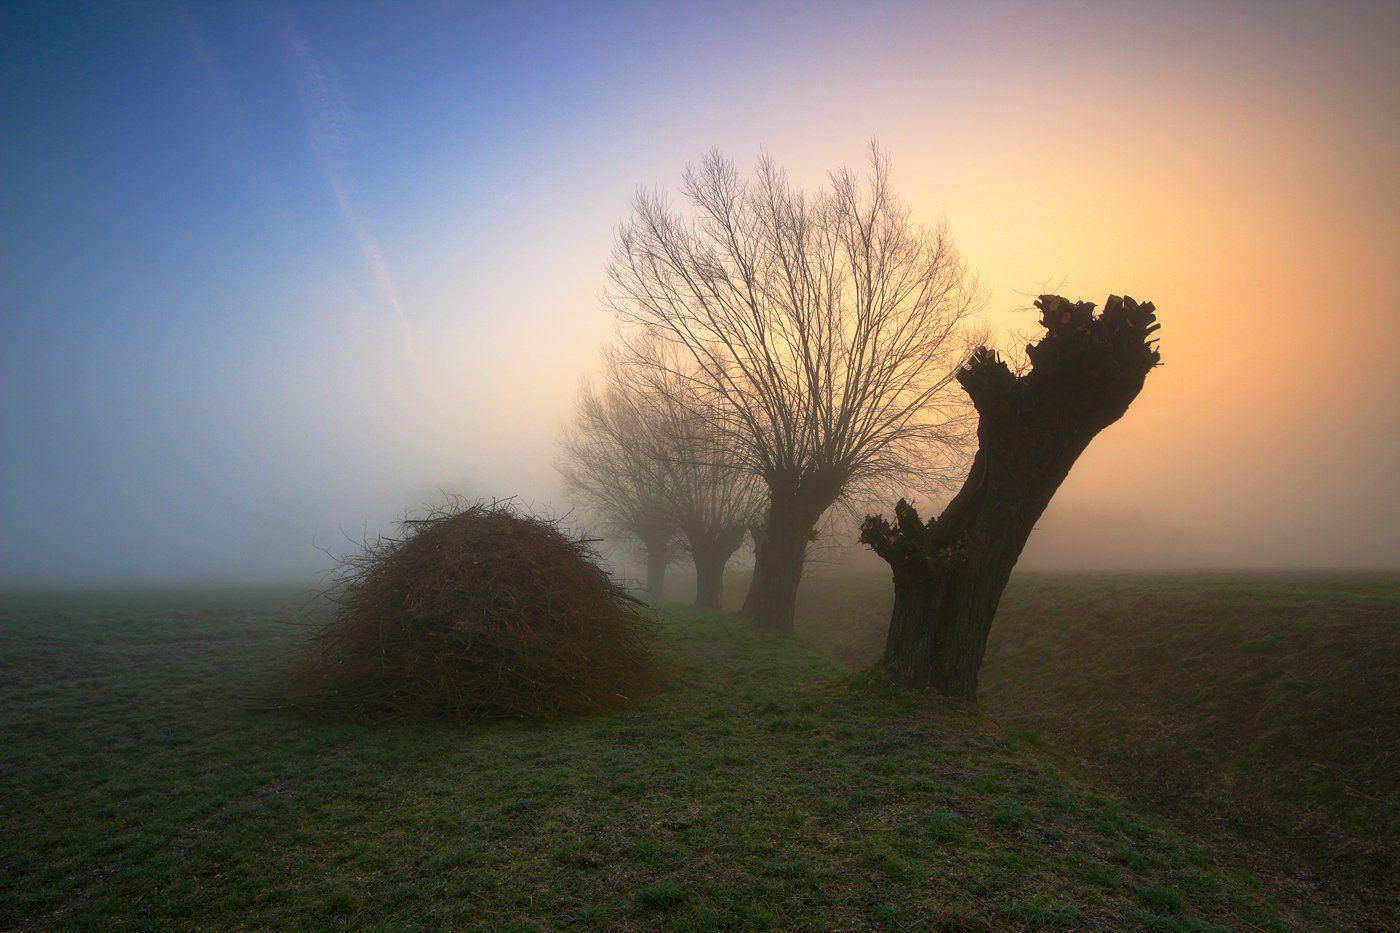 sunrise, morning, down, mist, willow, trees, mood, Jacek Lisiewicz